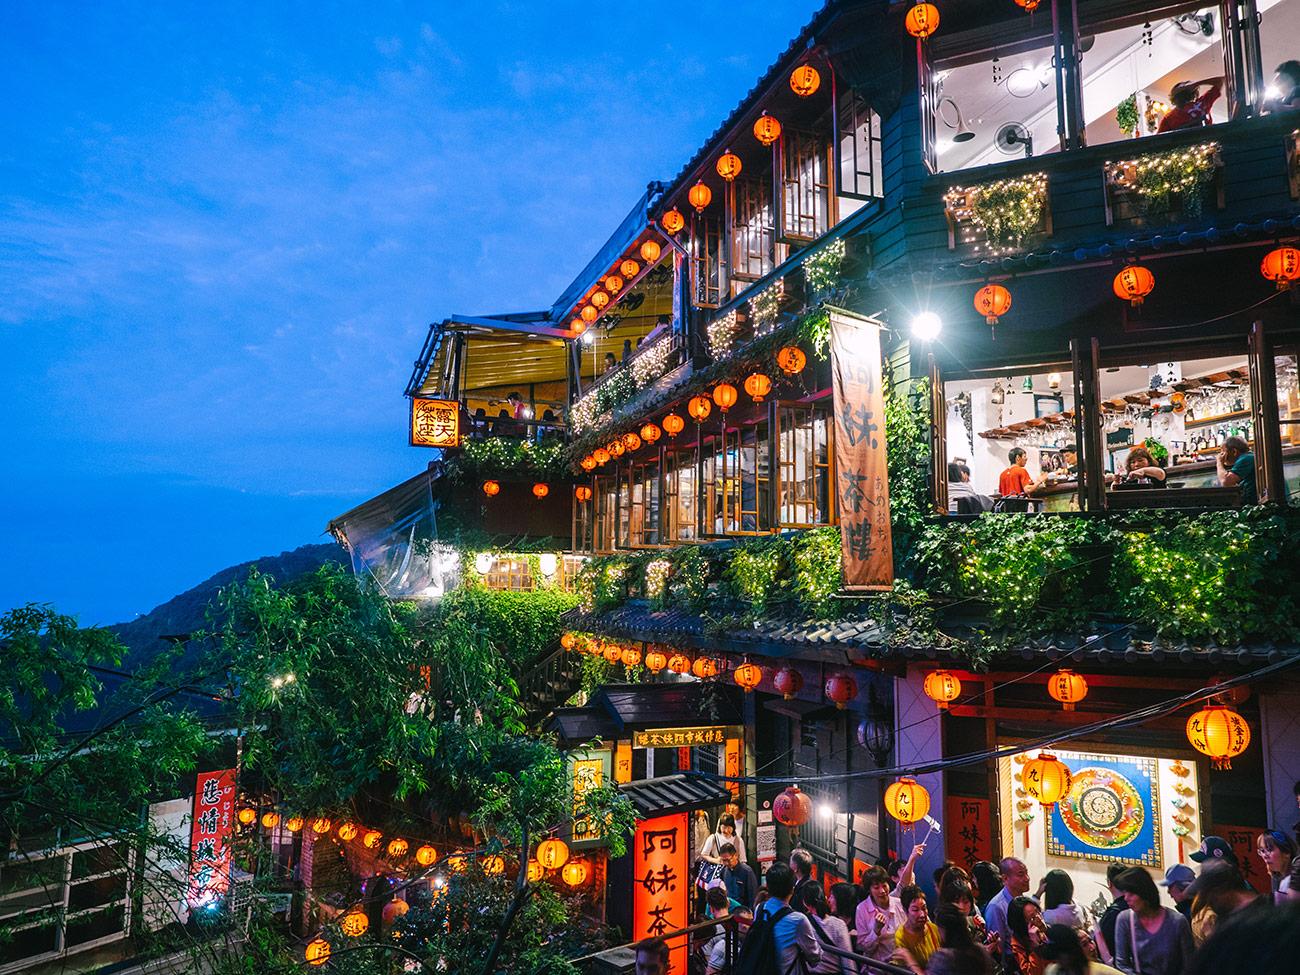 Taipei Jiufen - Ah Mei Teahouse